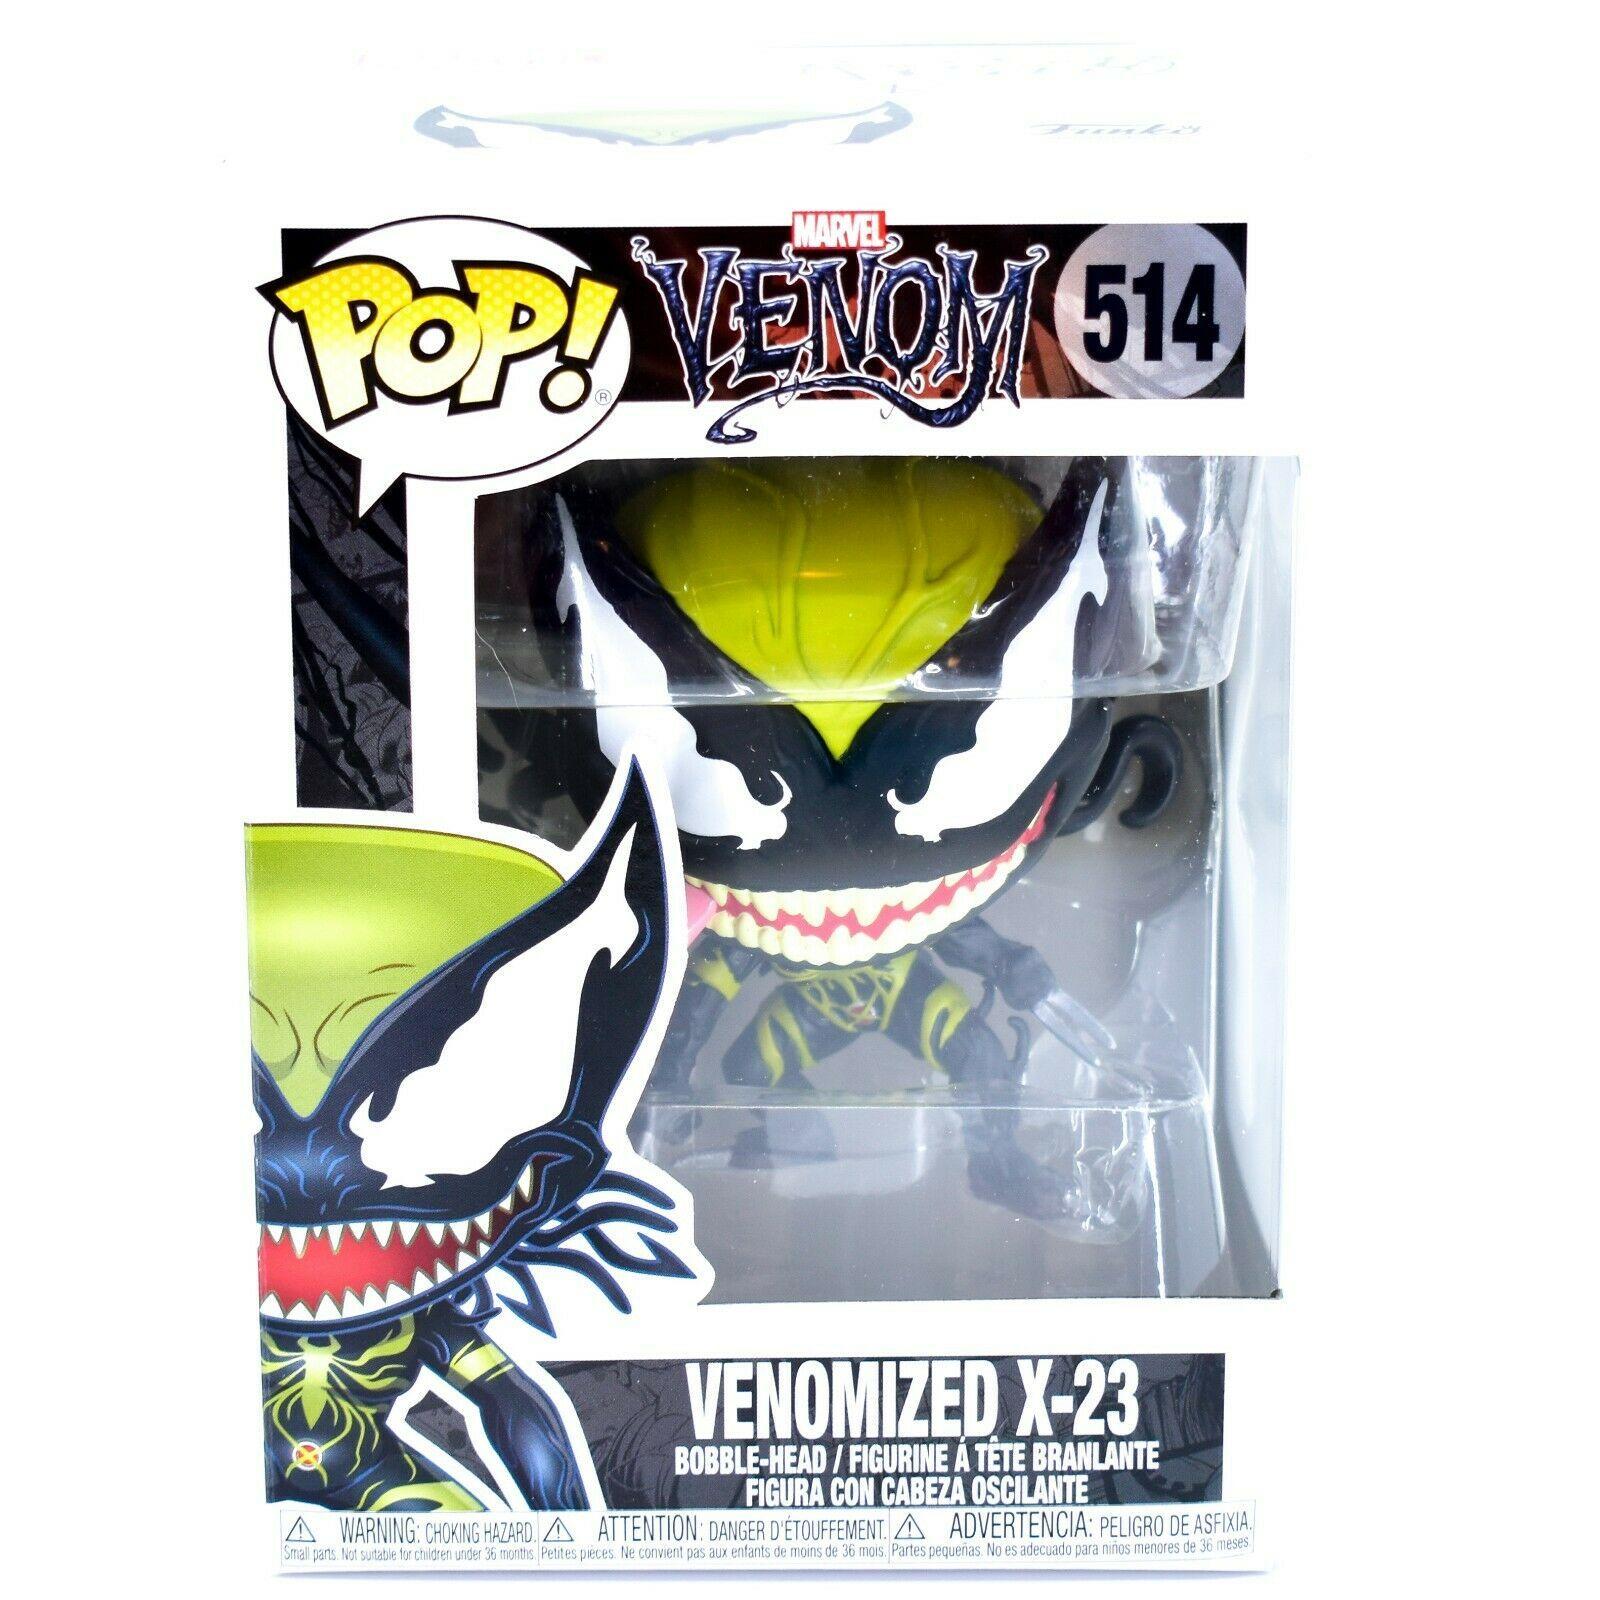 Funko Pop! Marvel Venom Venomized X-23 #514 Bobble-Head Vinyl Action Figure